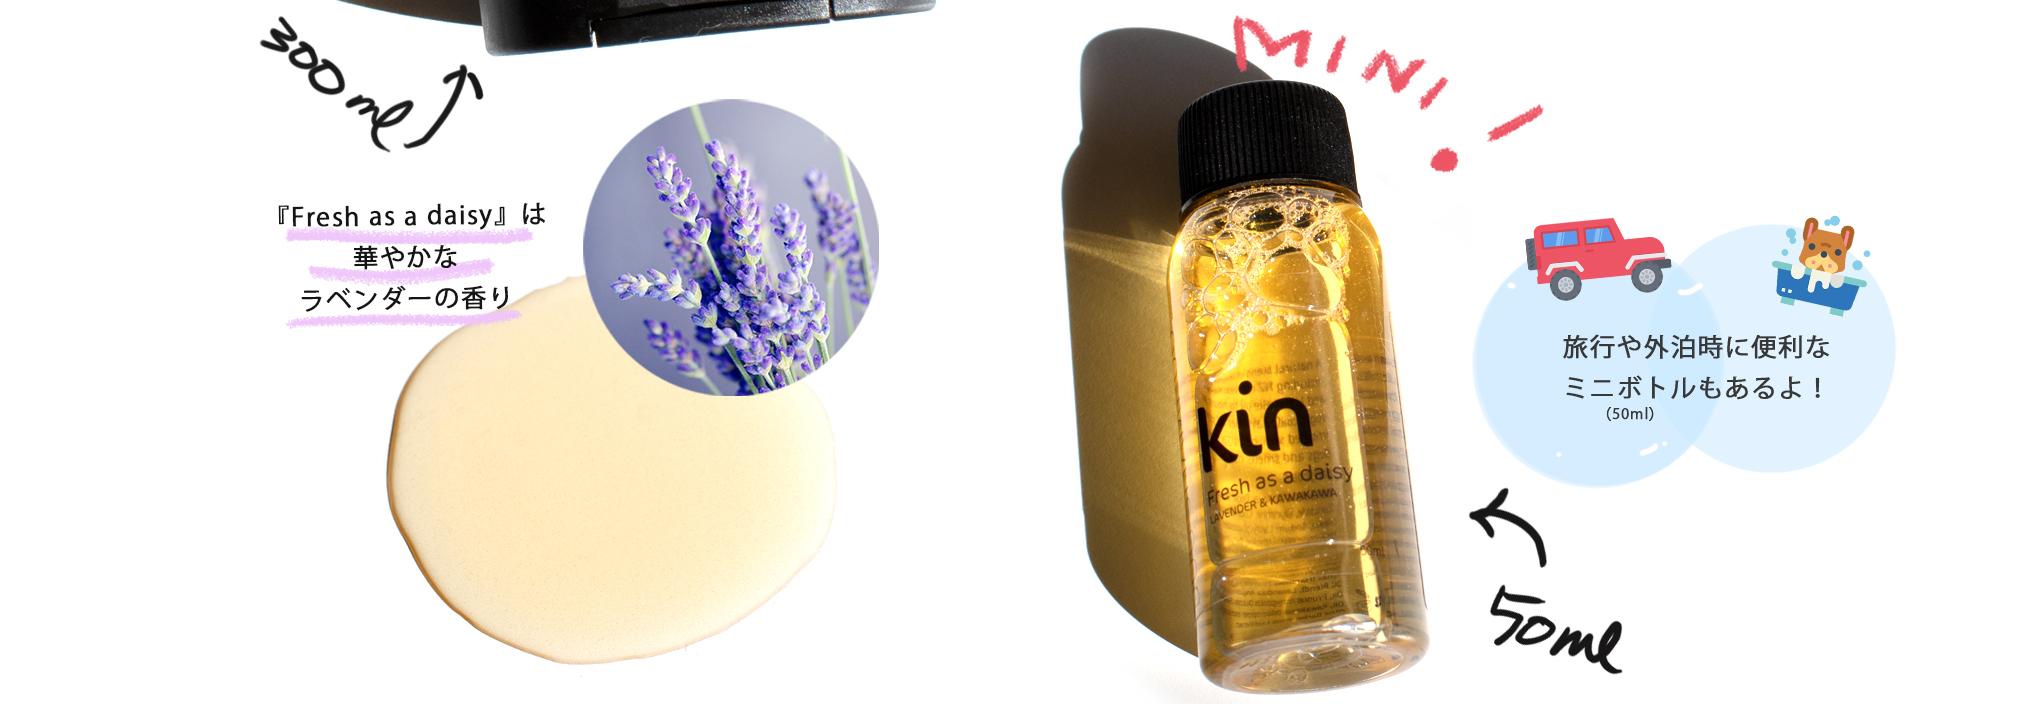 Fancy Pantsは心落ち着くラベンダーの香り。旅行や外泊時に便利なミニボトル(50ml)もあるよ!|Kin(キン)